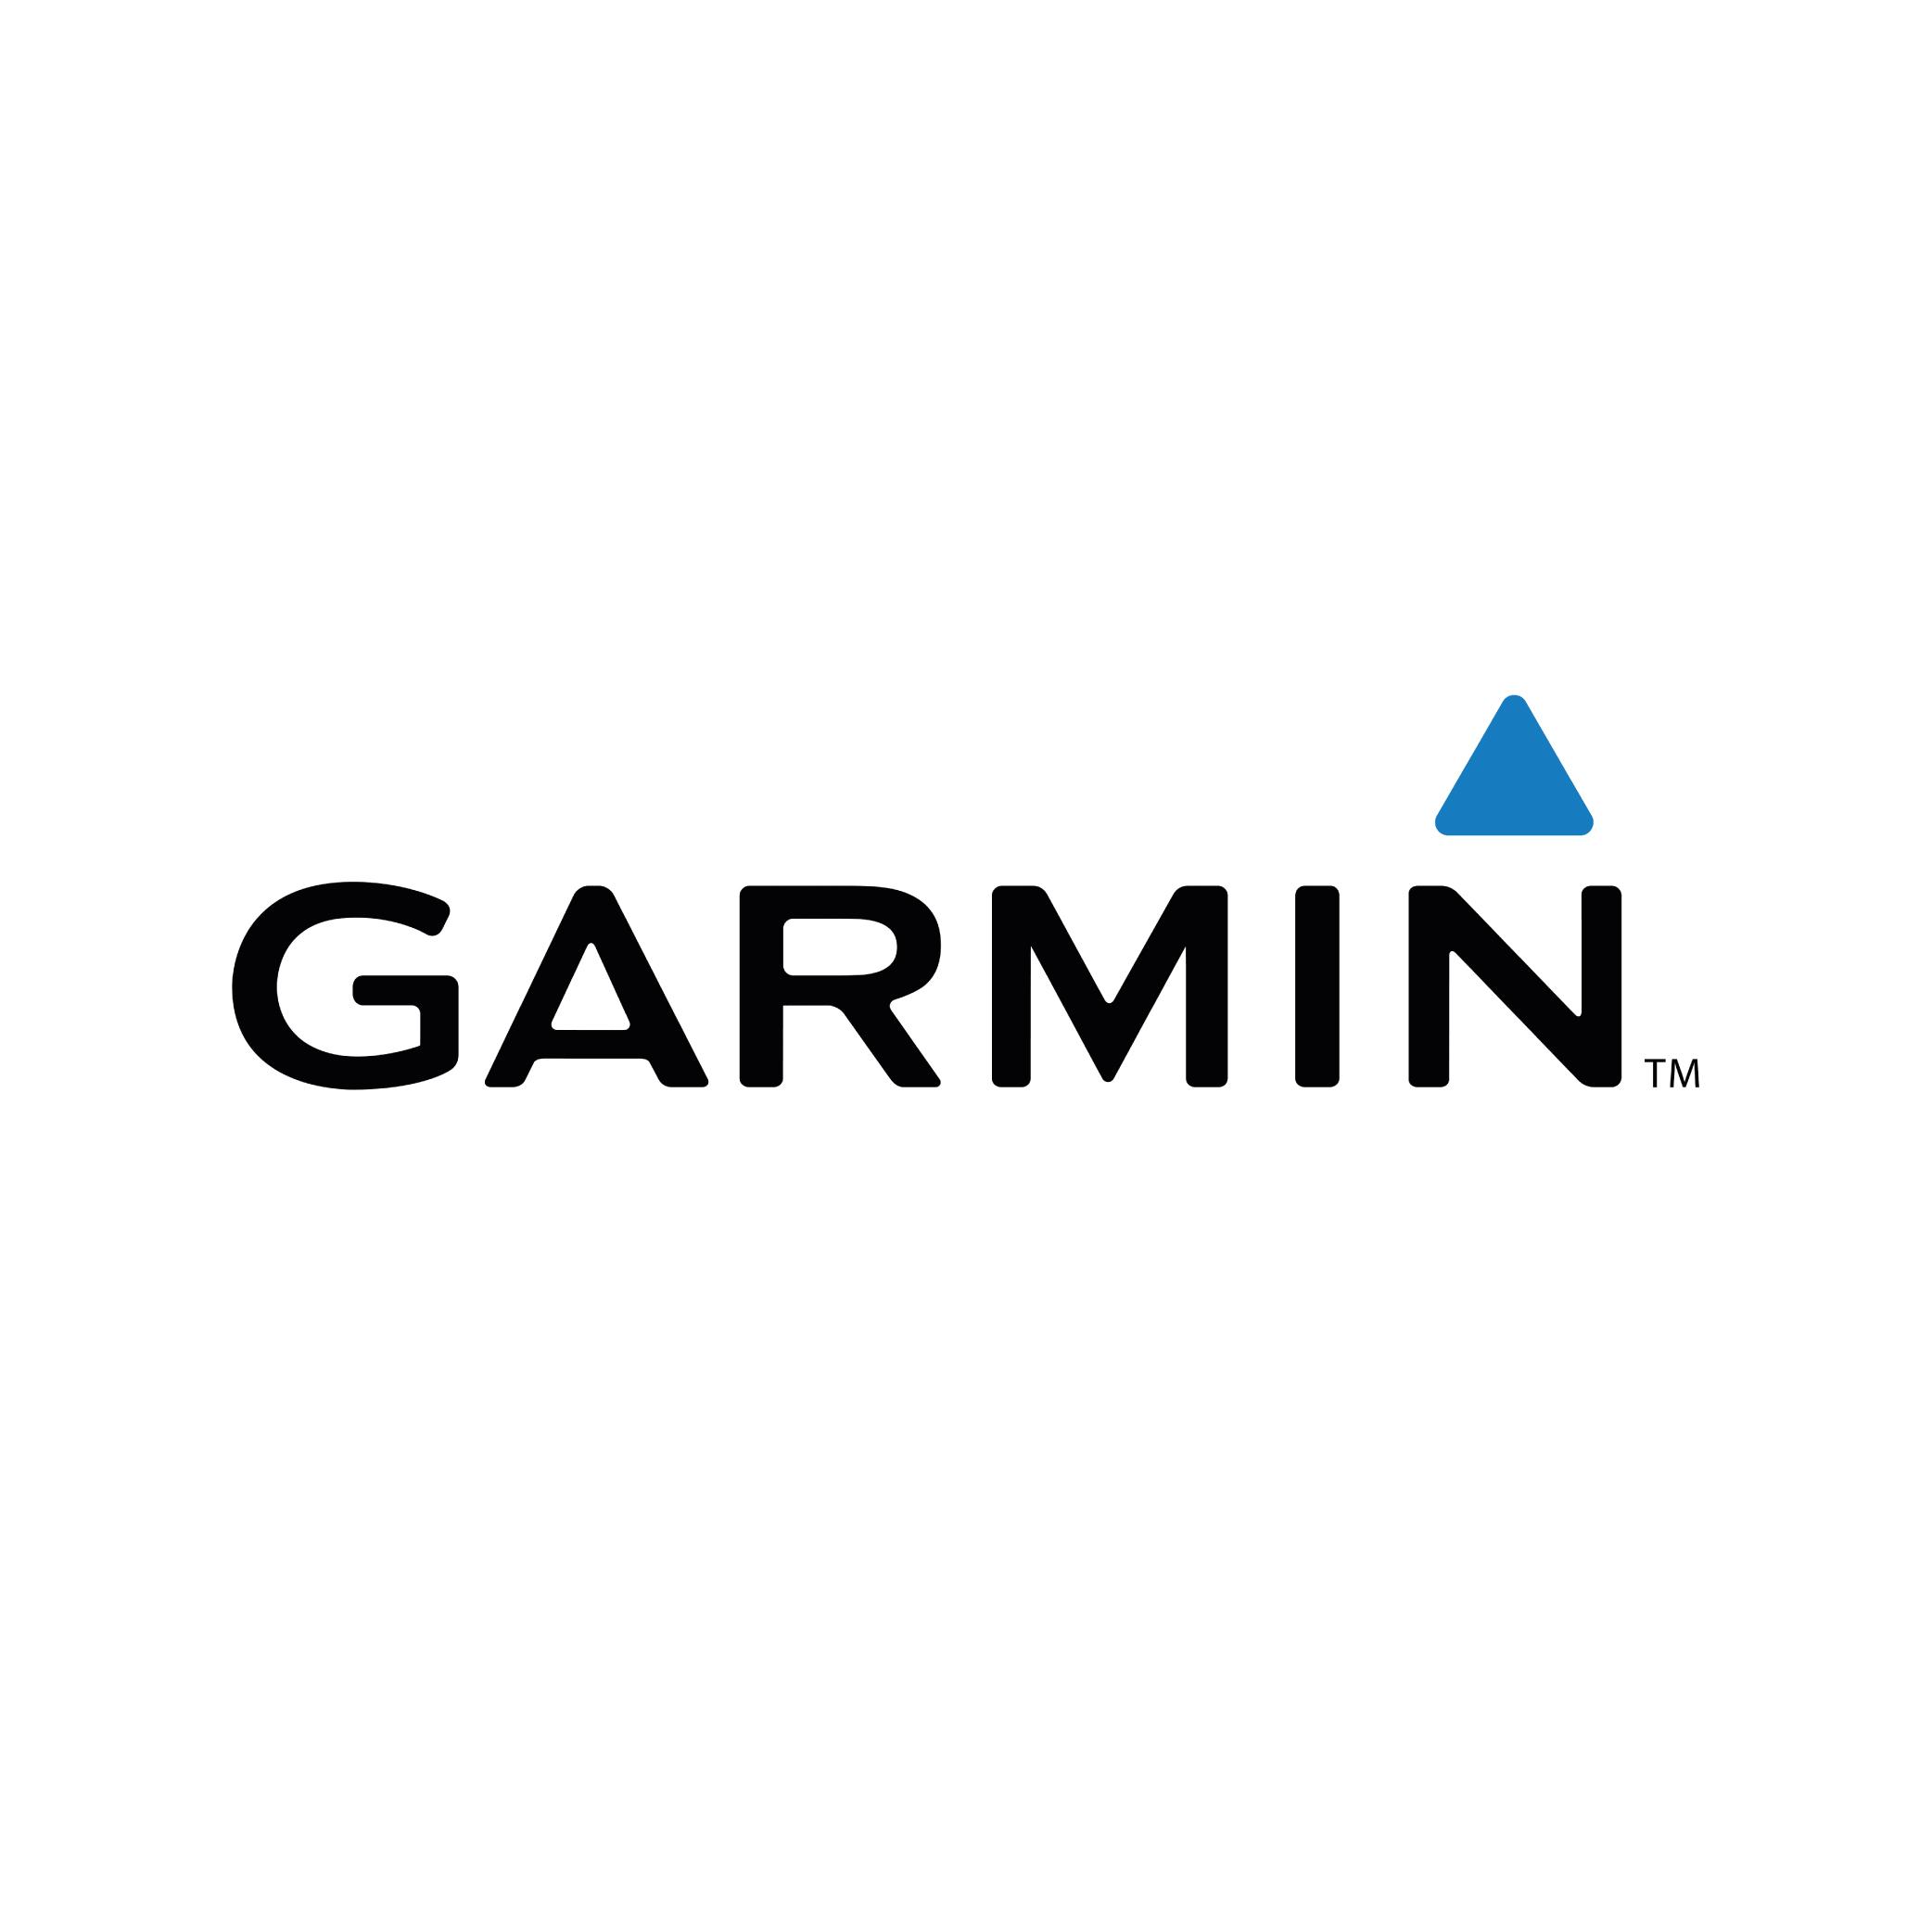 logo_garmin_black_friday